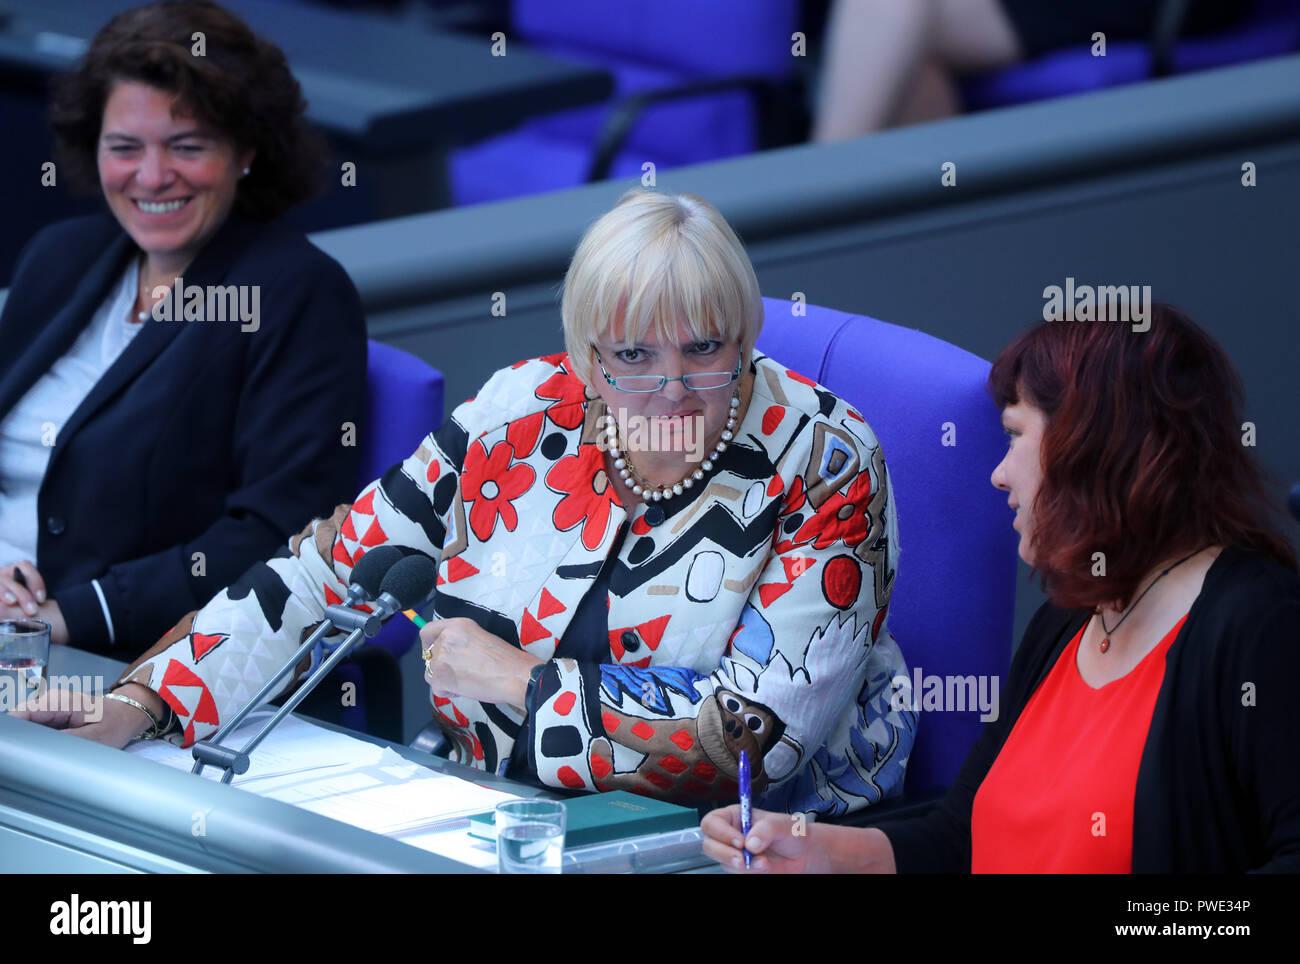 11 October 2018, Berlin: 11 October 2018, Germany, Berlin: Claudia Roth (Allianced 90/Greens), Deputy President of the Bundestag, speaks in the Bundestag. Photo: Jens Büttner/dpa-Zentralbild/dpa - Stock Image